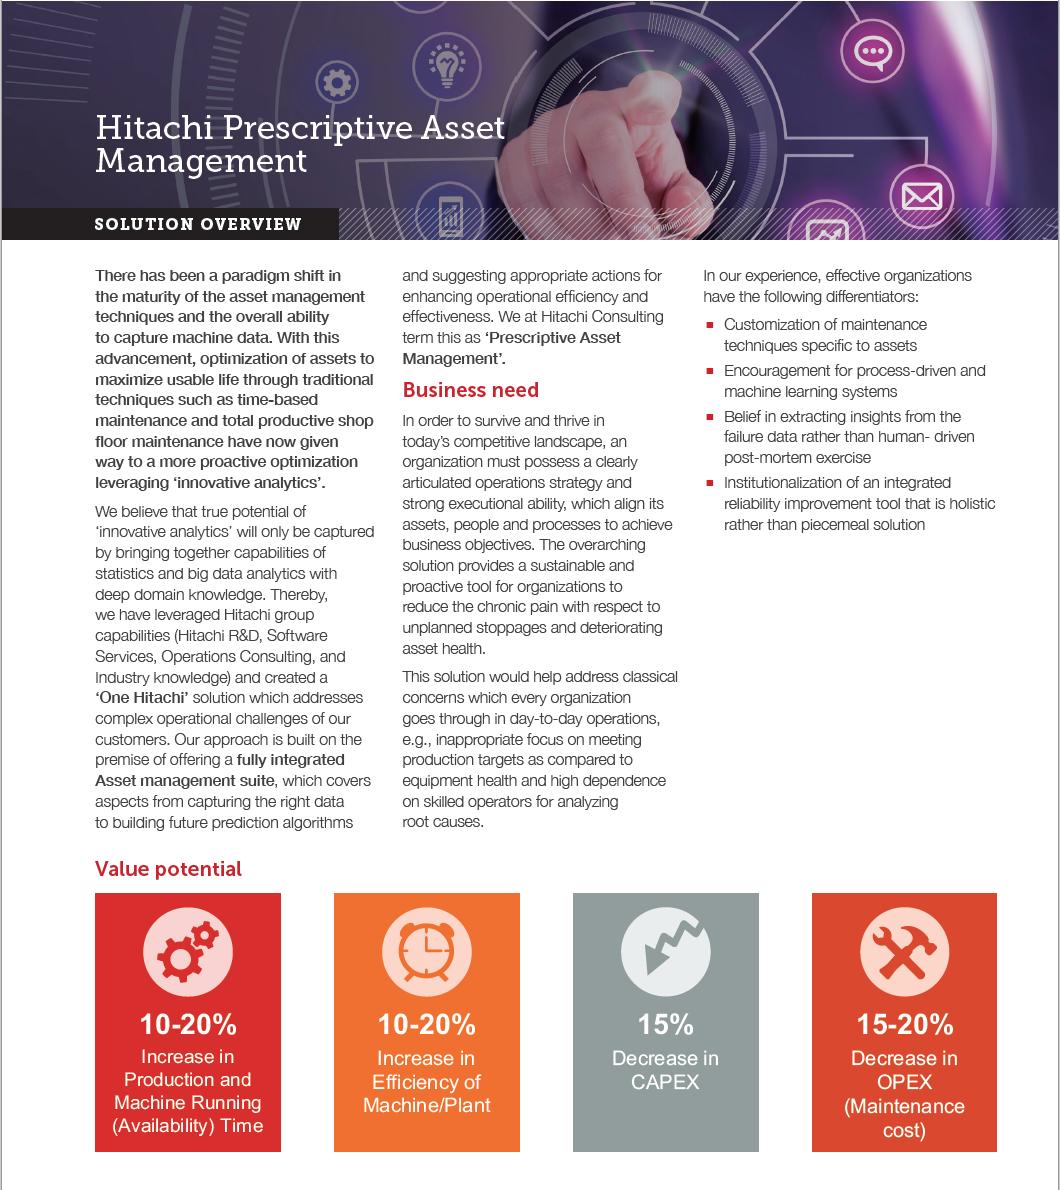 Hitachi Prescriptive Asset Management Screenshot